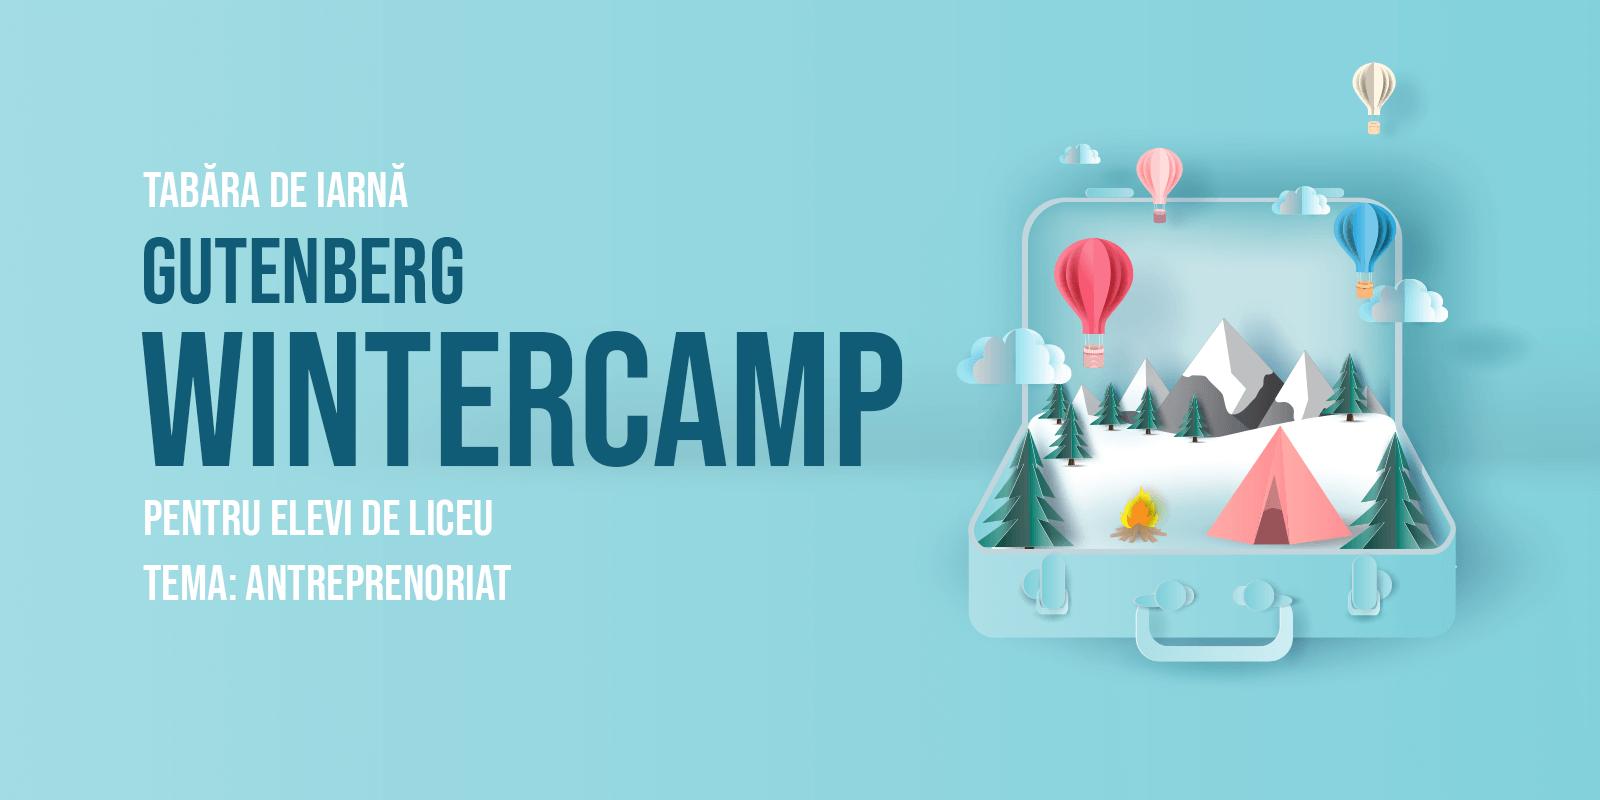 Tabara de iarna Gutenberg Wintercamp